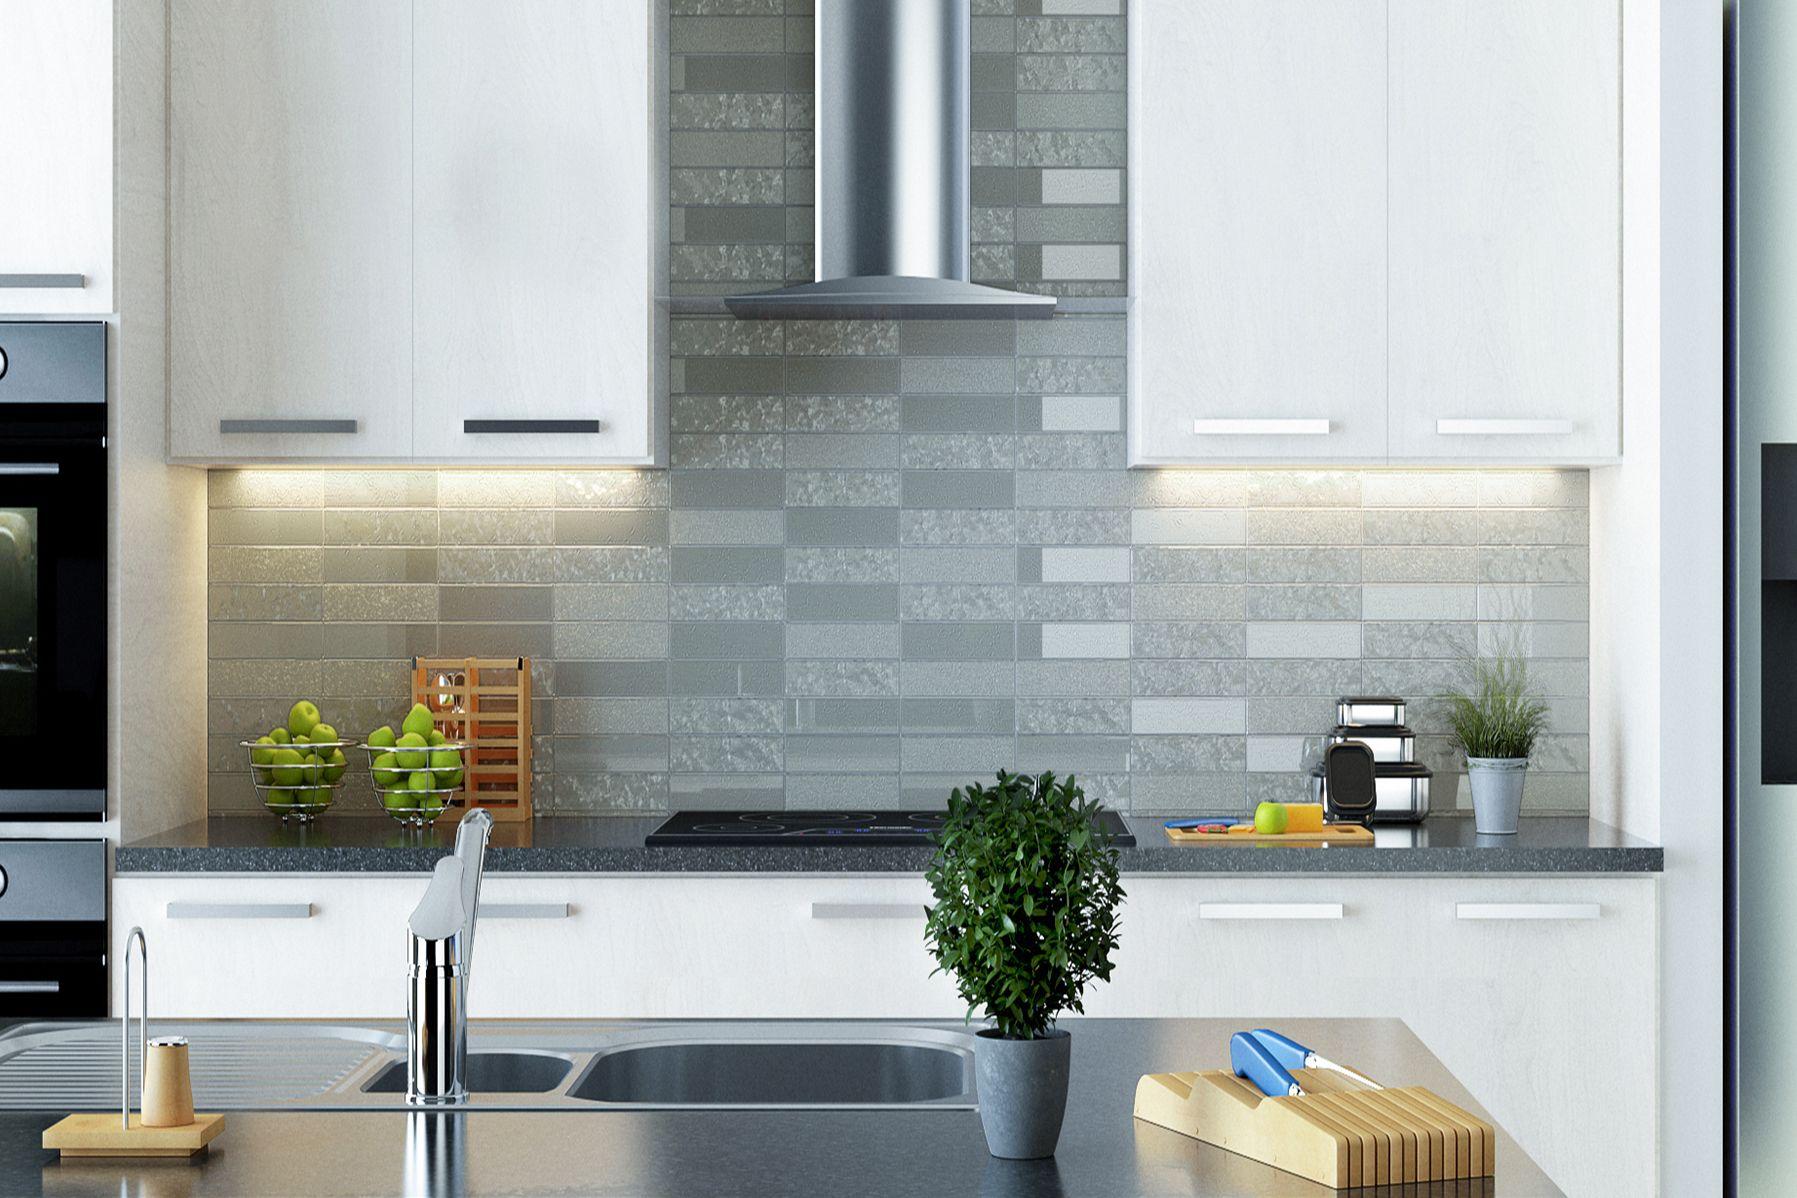 Easy breezy Como tile by Interstyle #InterstyleGlass #GlassTile ...